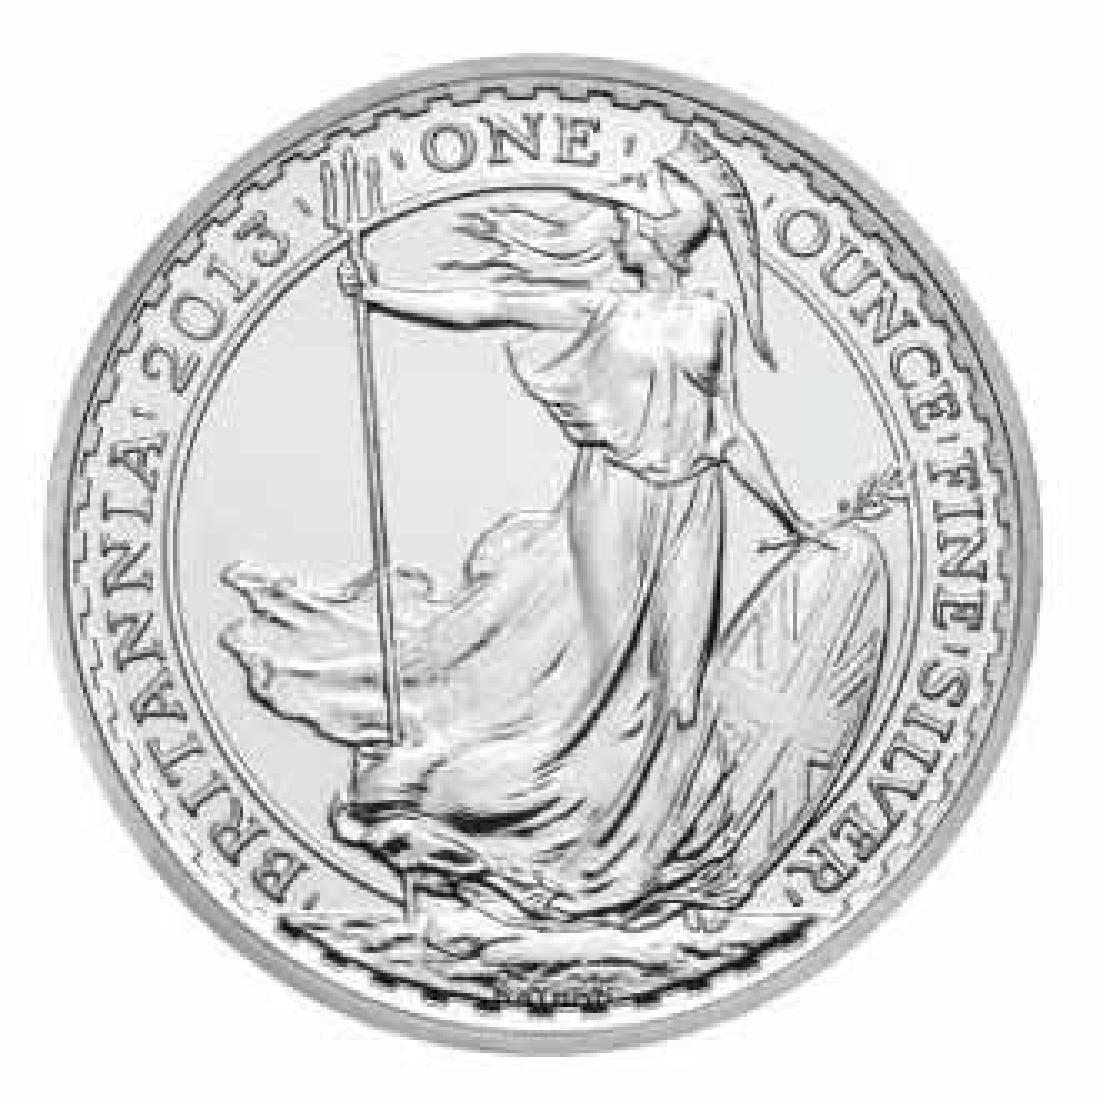 Uncirculated Silver Britannia 1 oz 2013